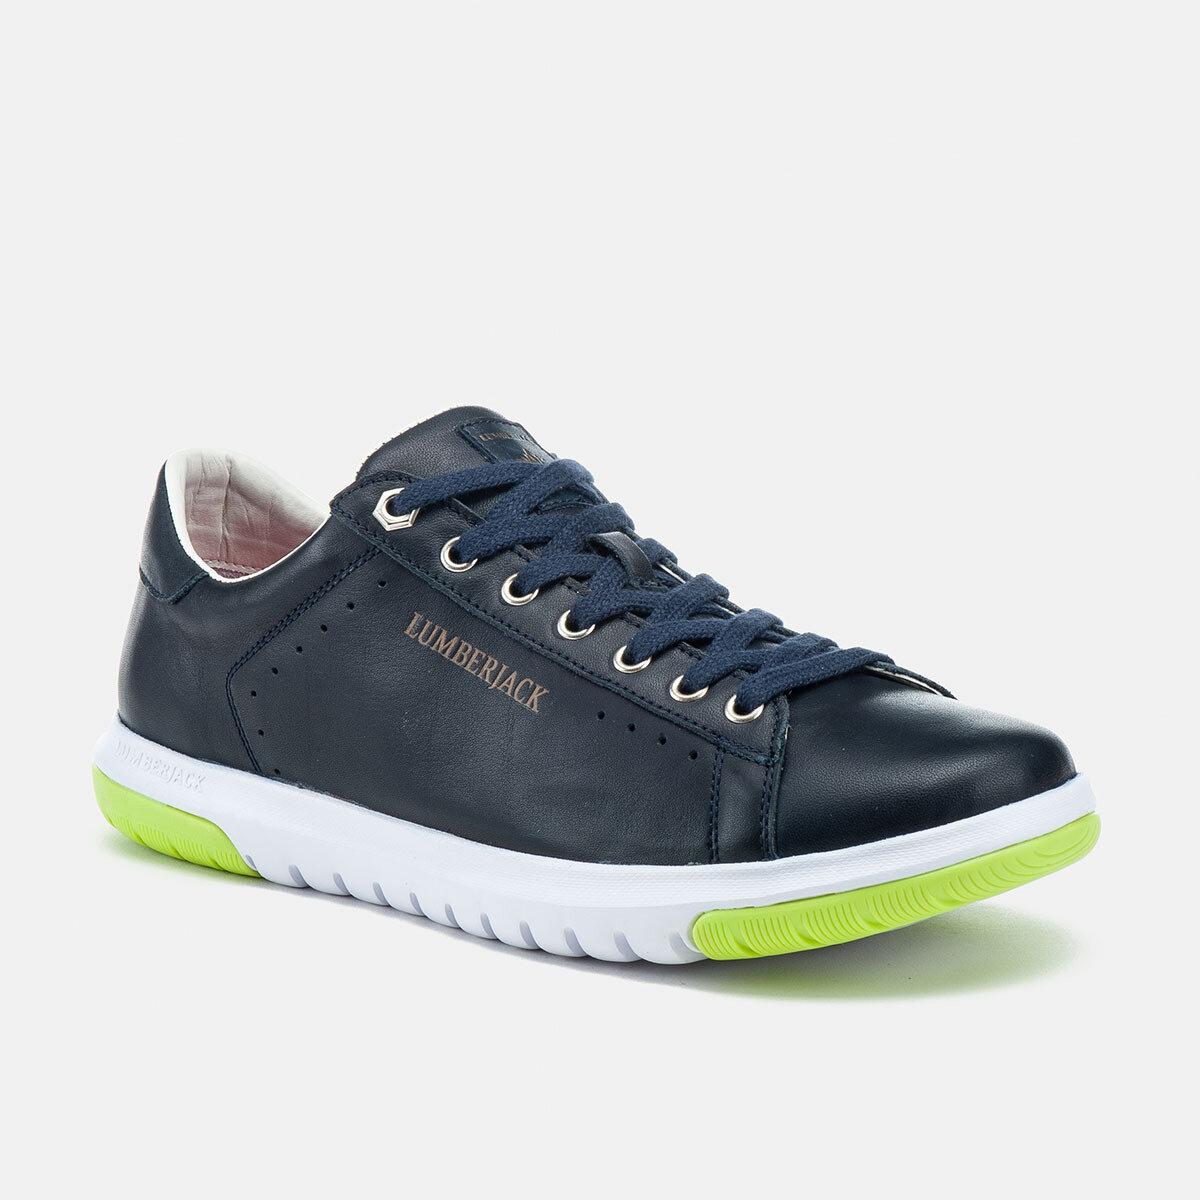 OTIS UNIVERSE BLUE Man Sneakers